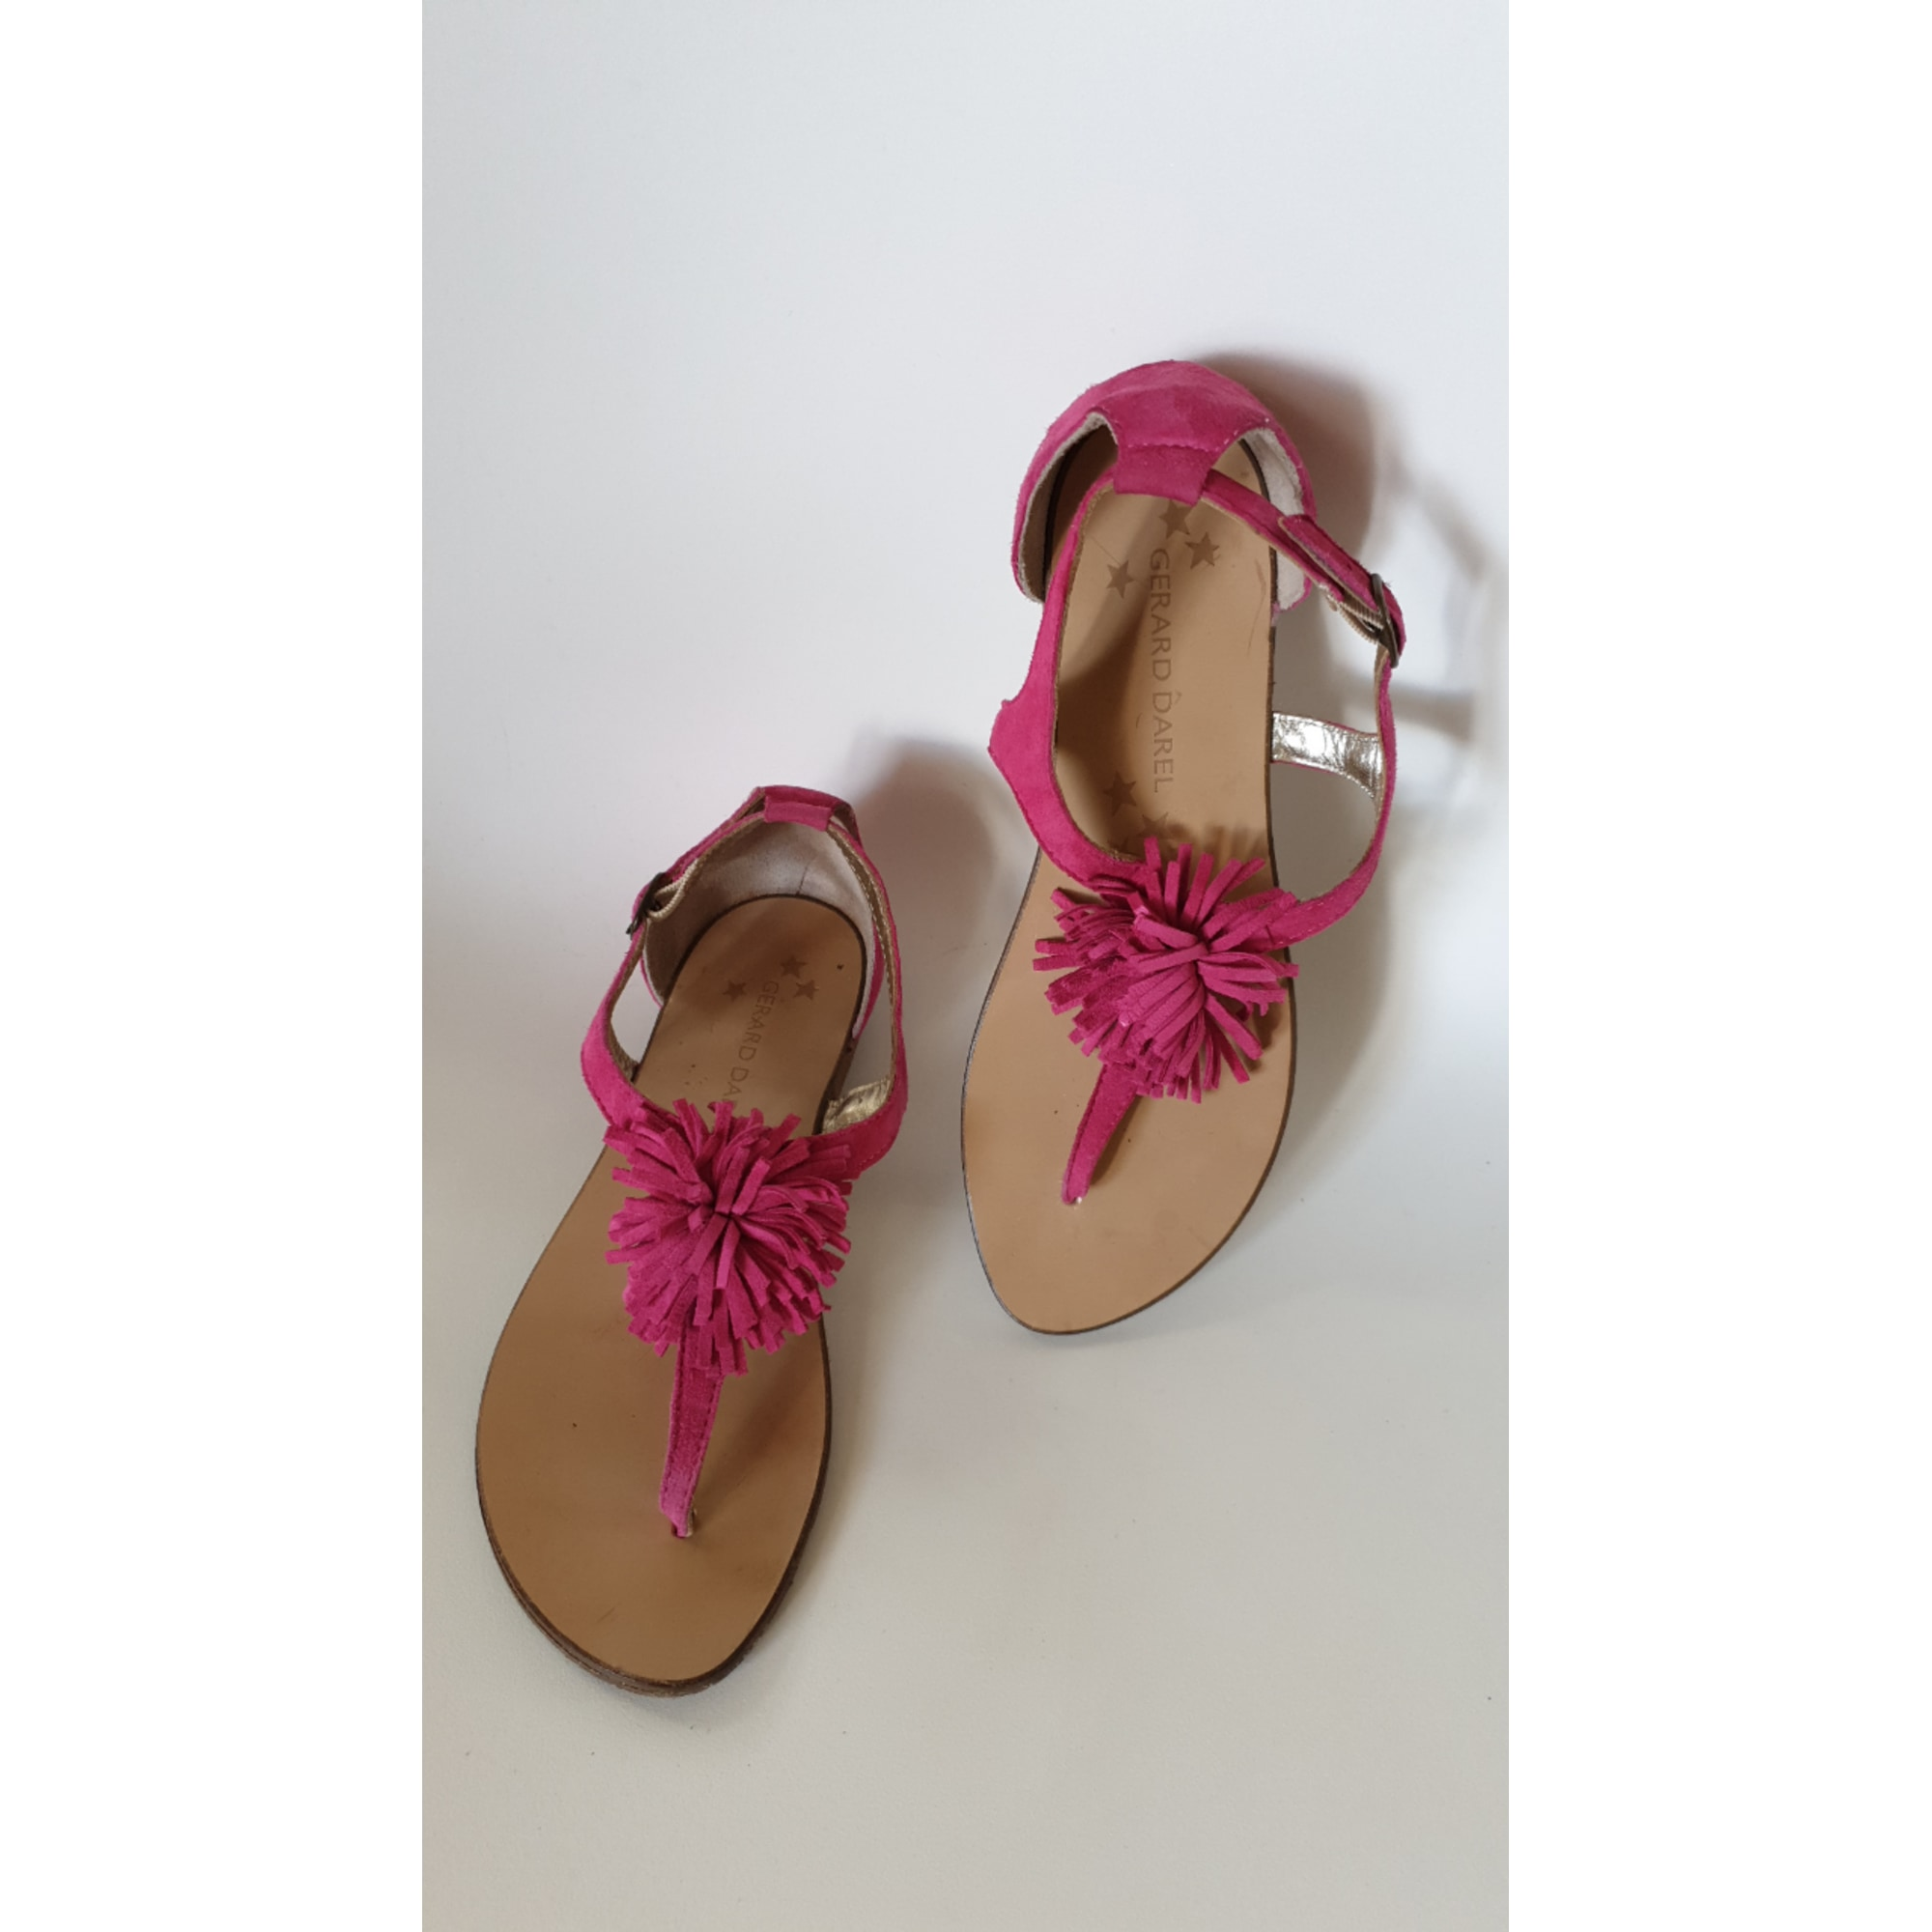 Sandales plates  GERARD DAREL Rose, fuschia, vieux rose